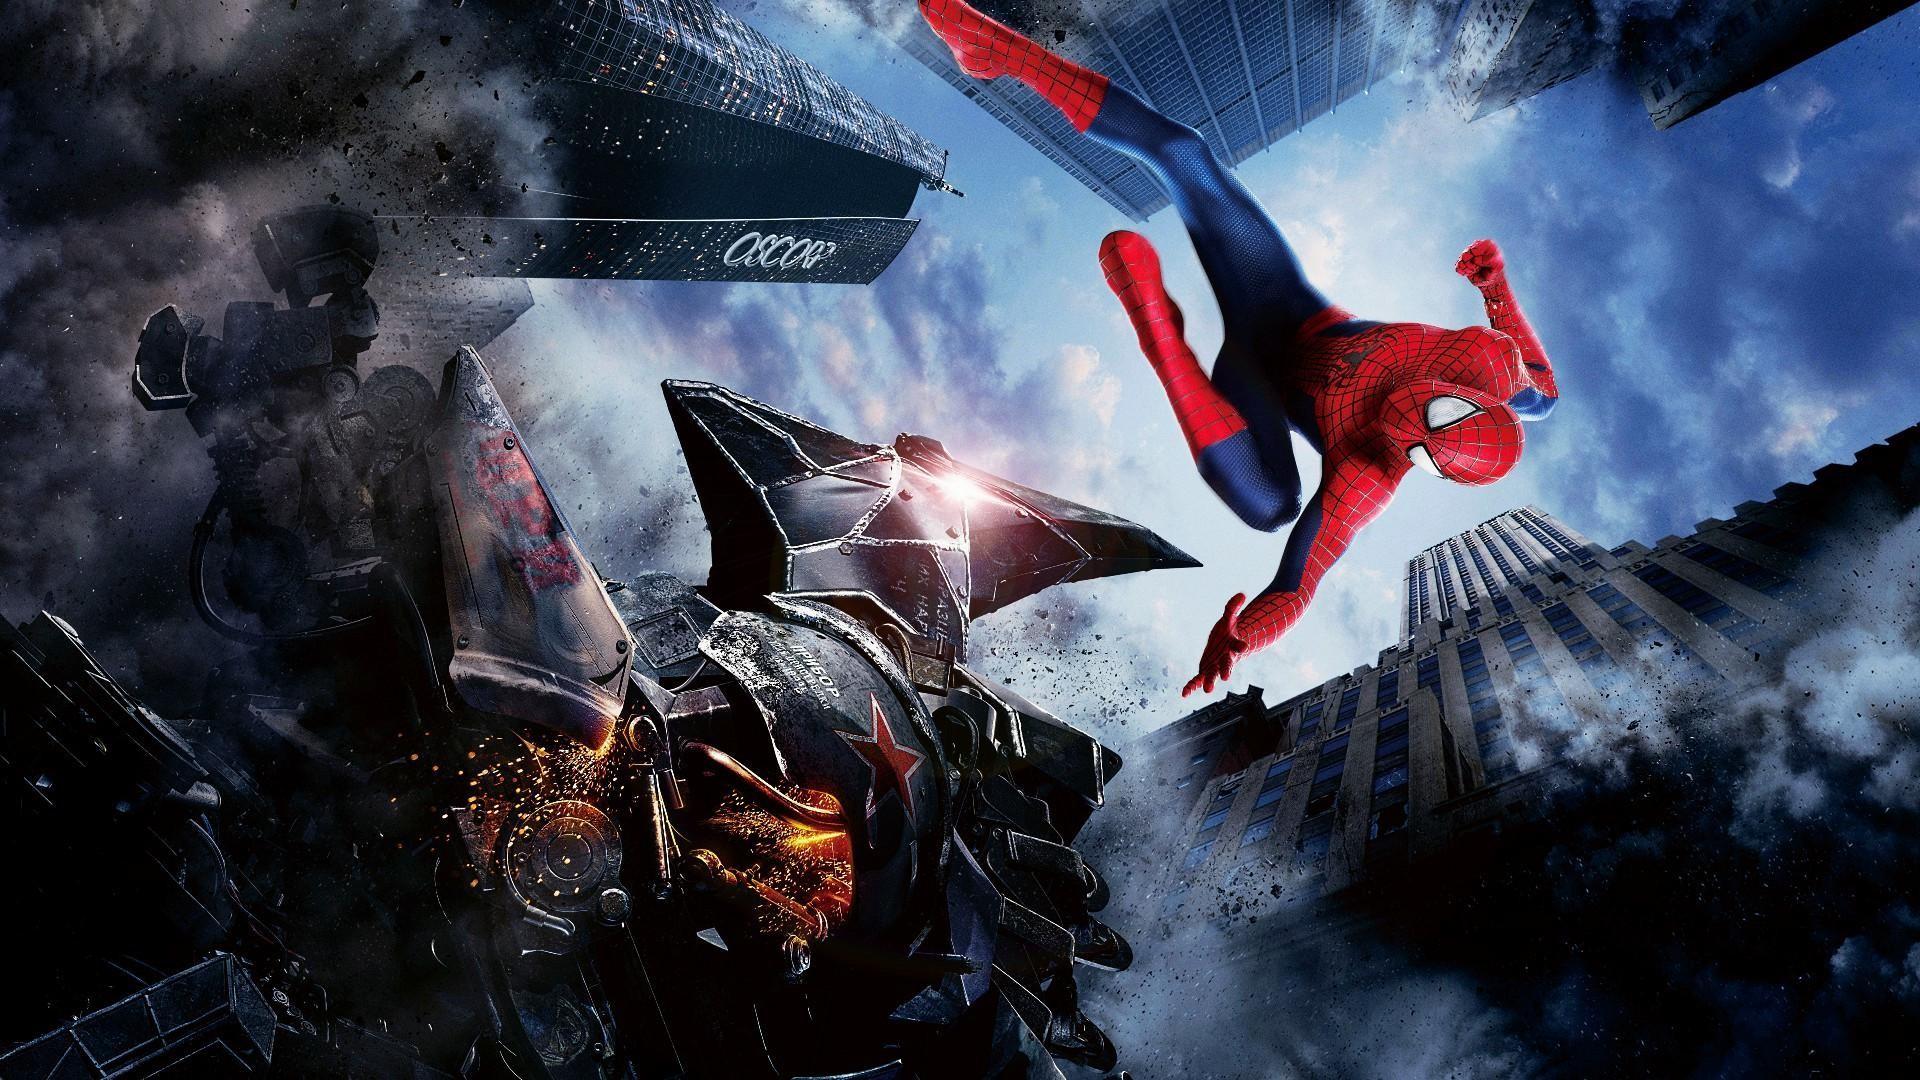 Spiderman-HD-1920%C3%971080-Spiderman-Picture-Adorab-